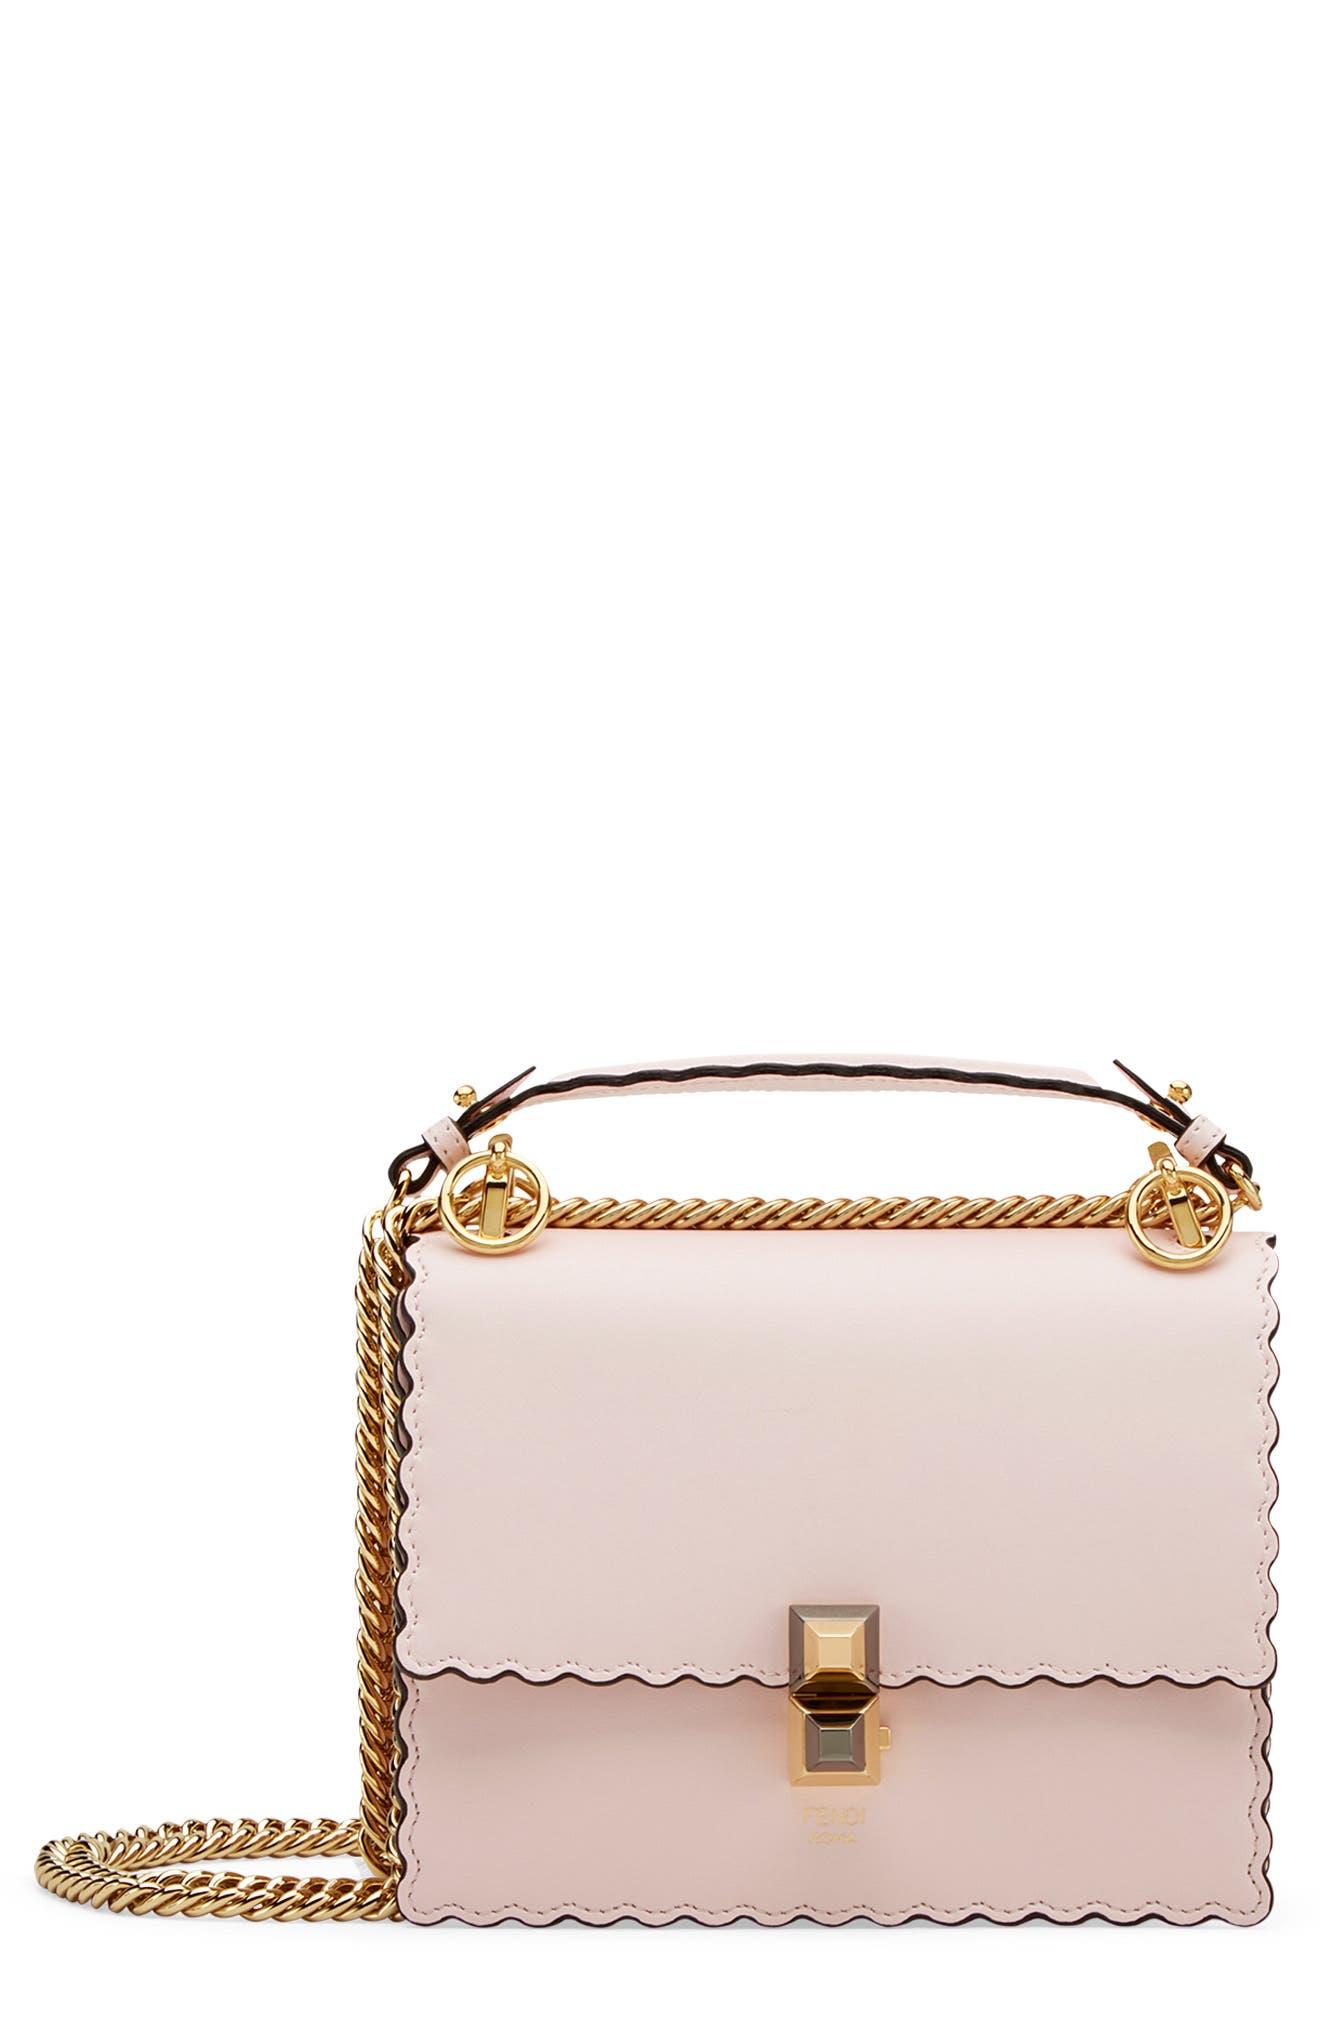 Mini Kan I Scalloped Leather Shoulder Bag,                             Main thumbnail 1, color,                             CONFETTO/ ORO SOFT